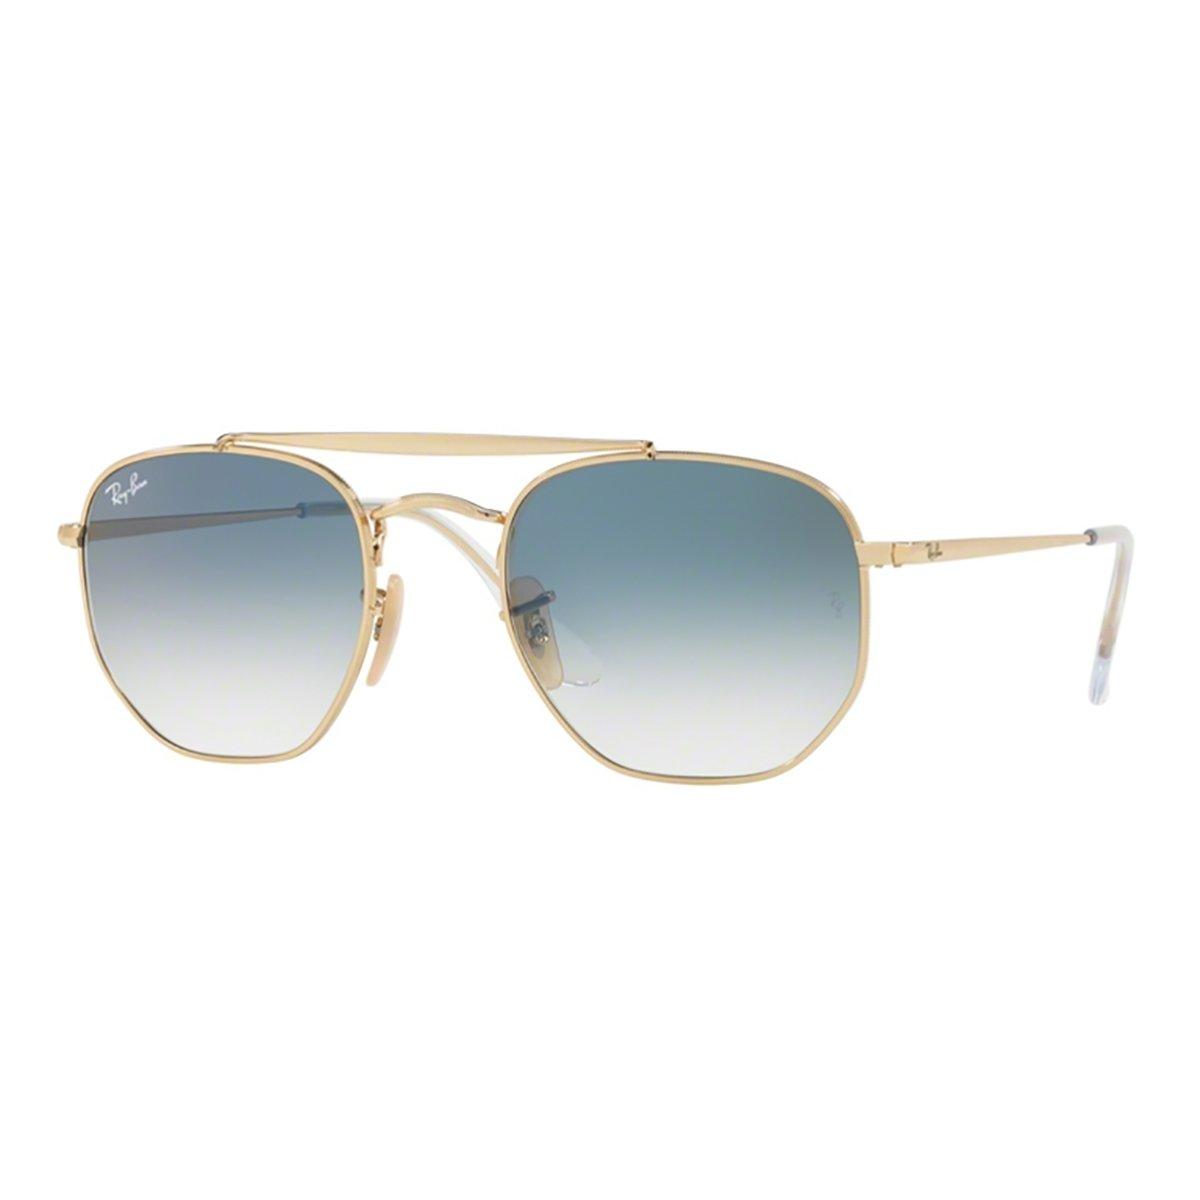 ac991df837bca Compre Óculos de Sol Ray Ban Marshal em 10X